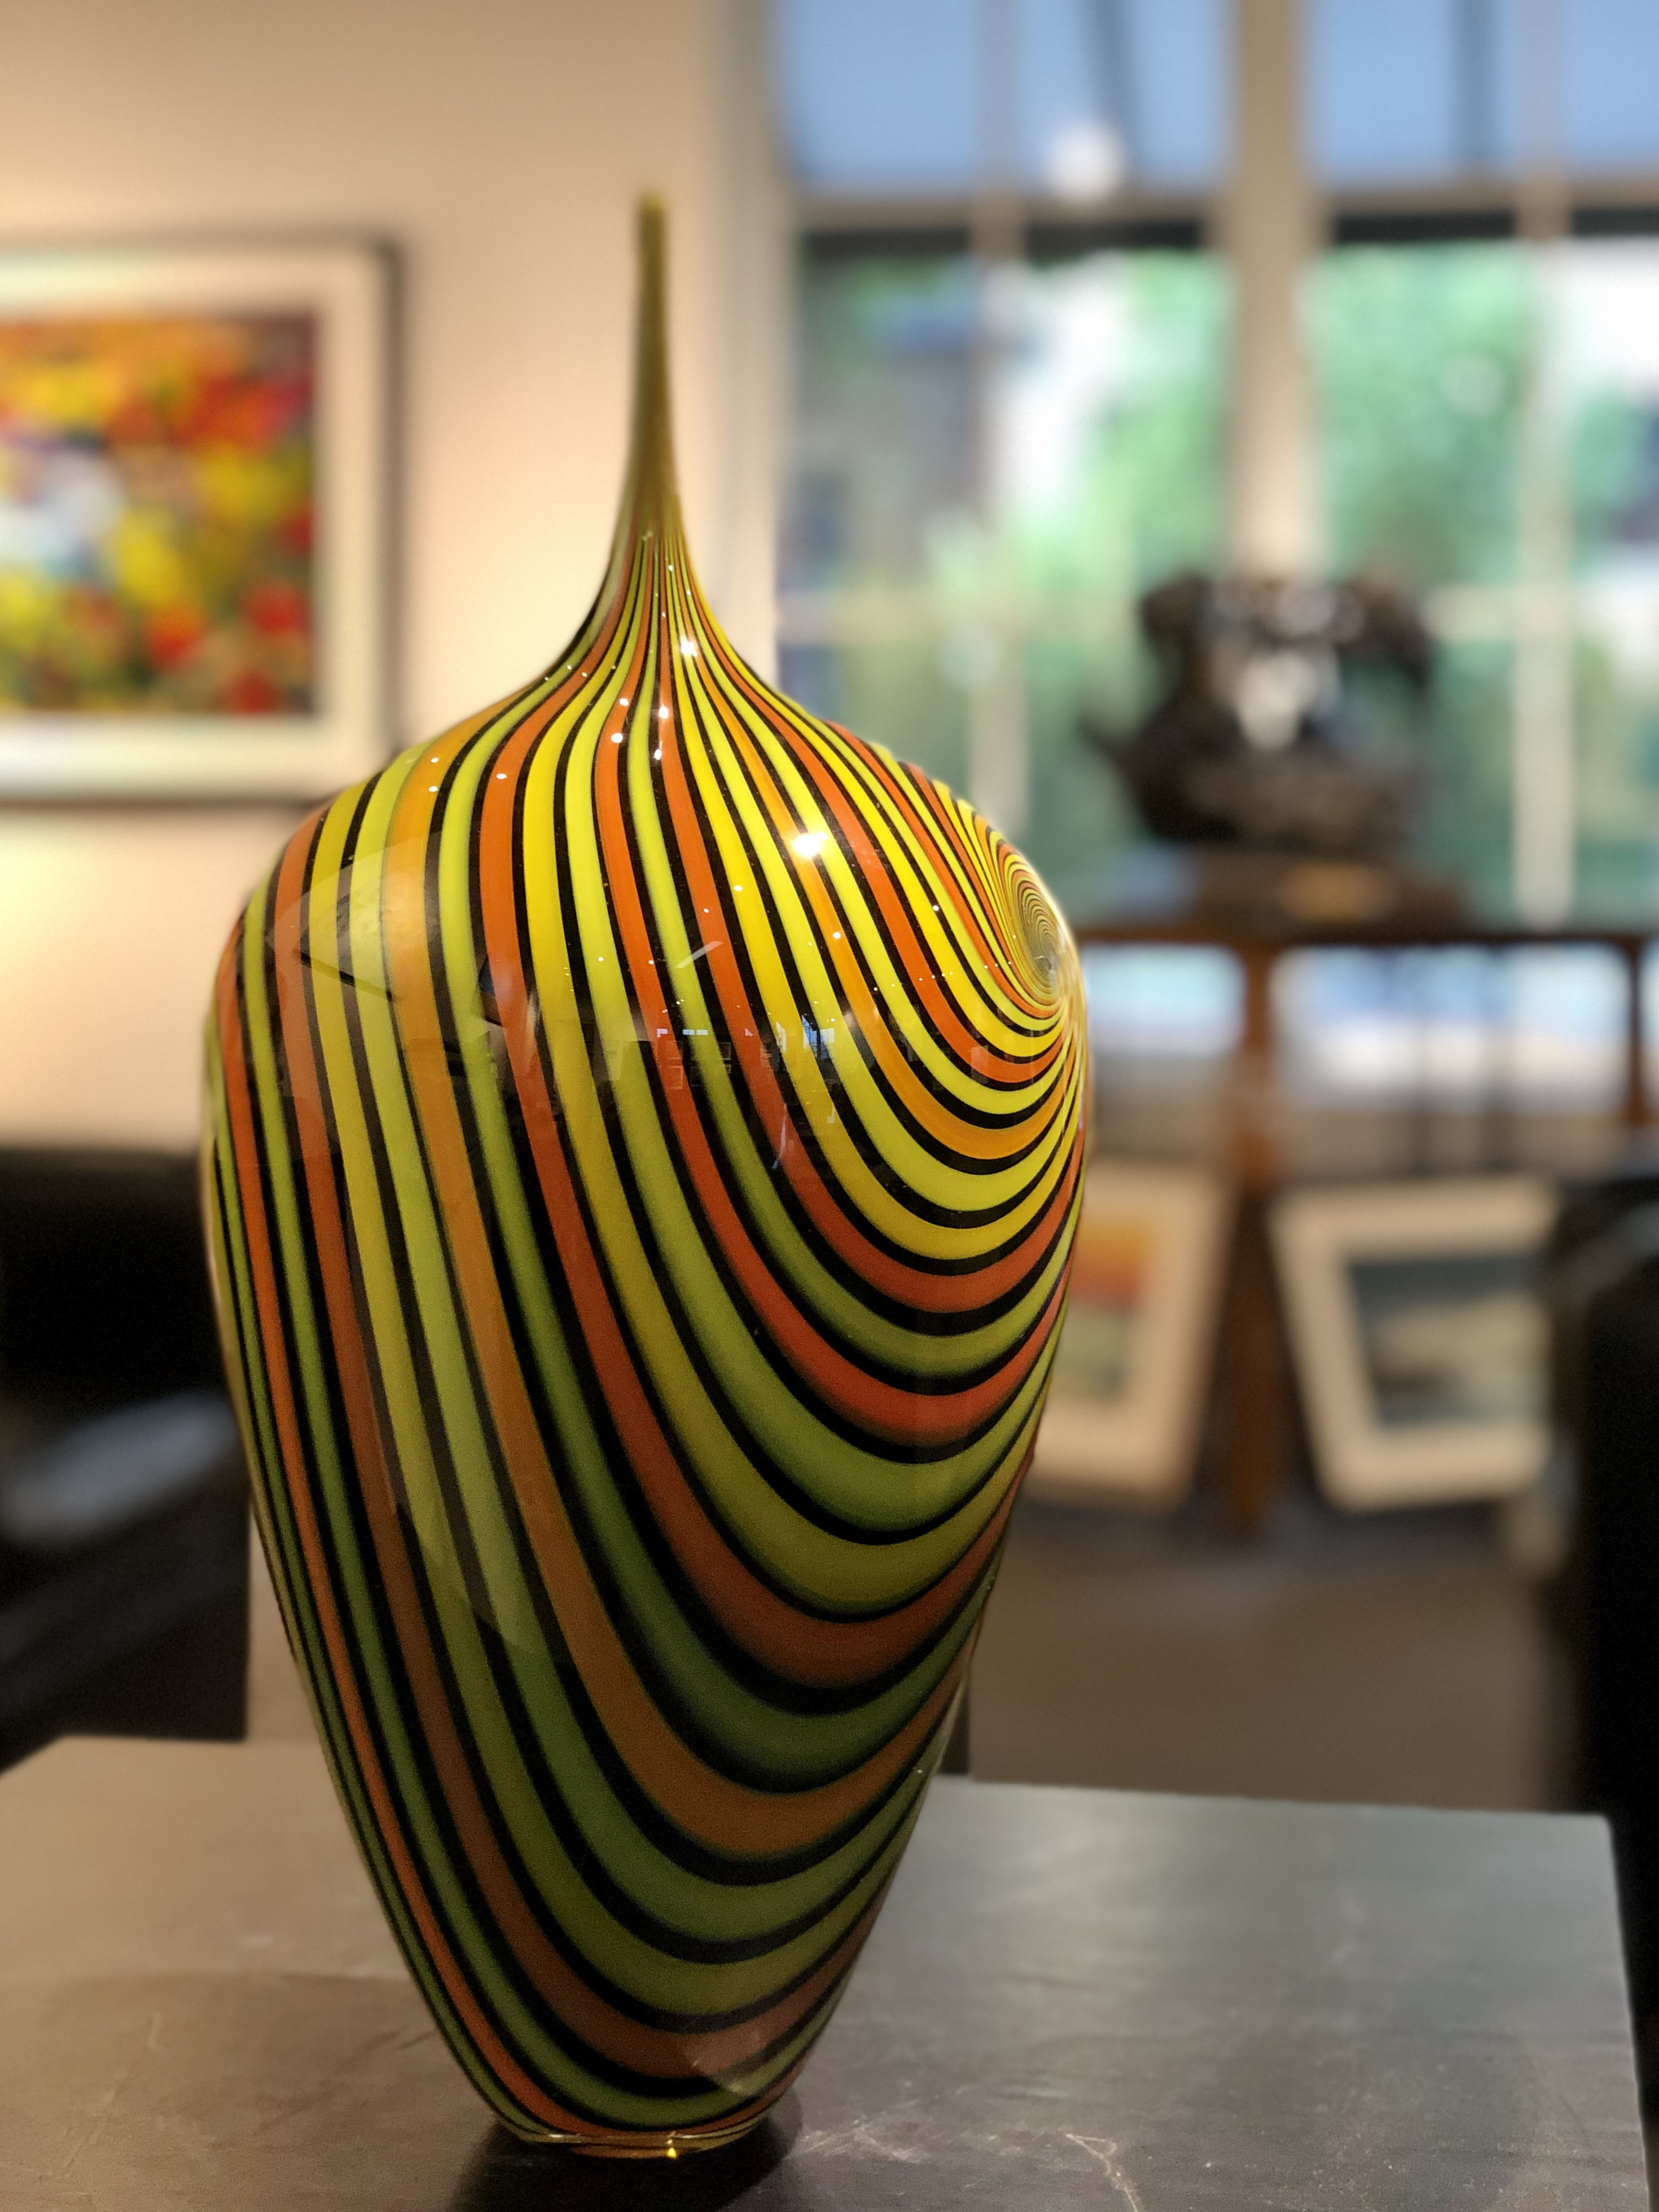 Tall Form Vortex by  Jeff Holmwood - Masterpiece Online